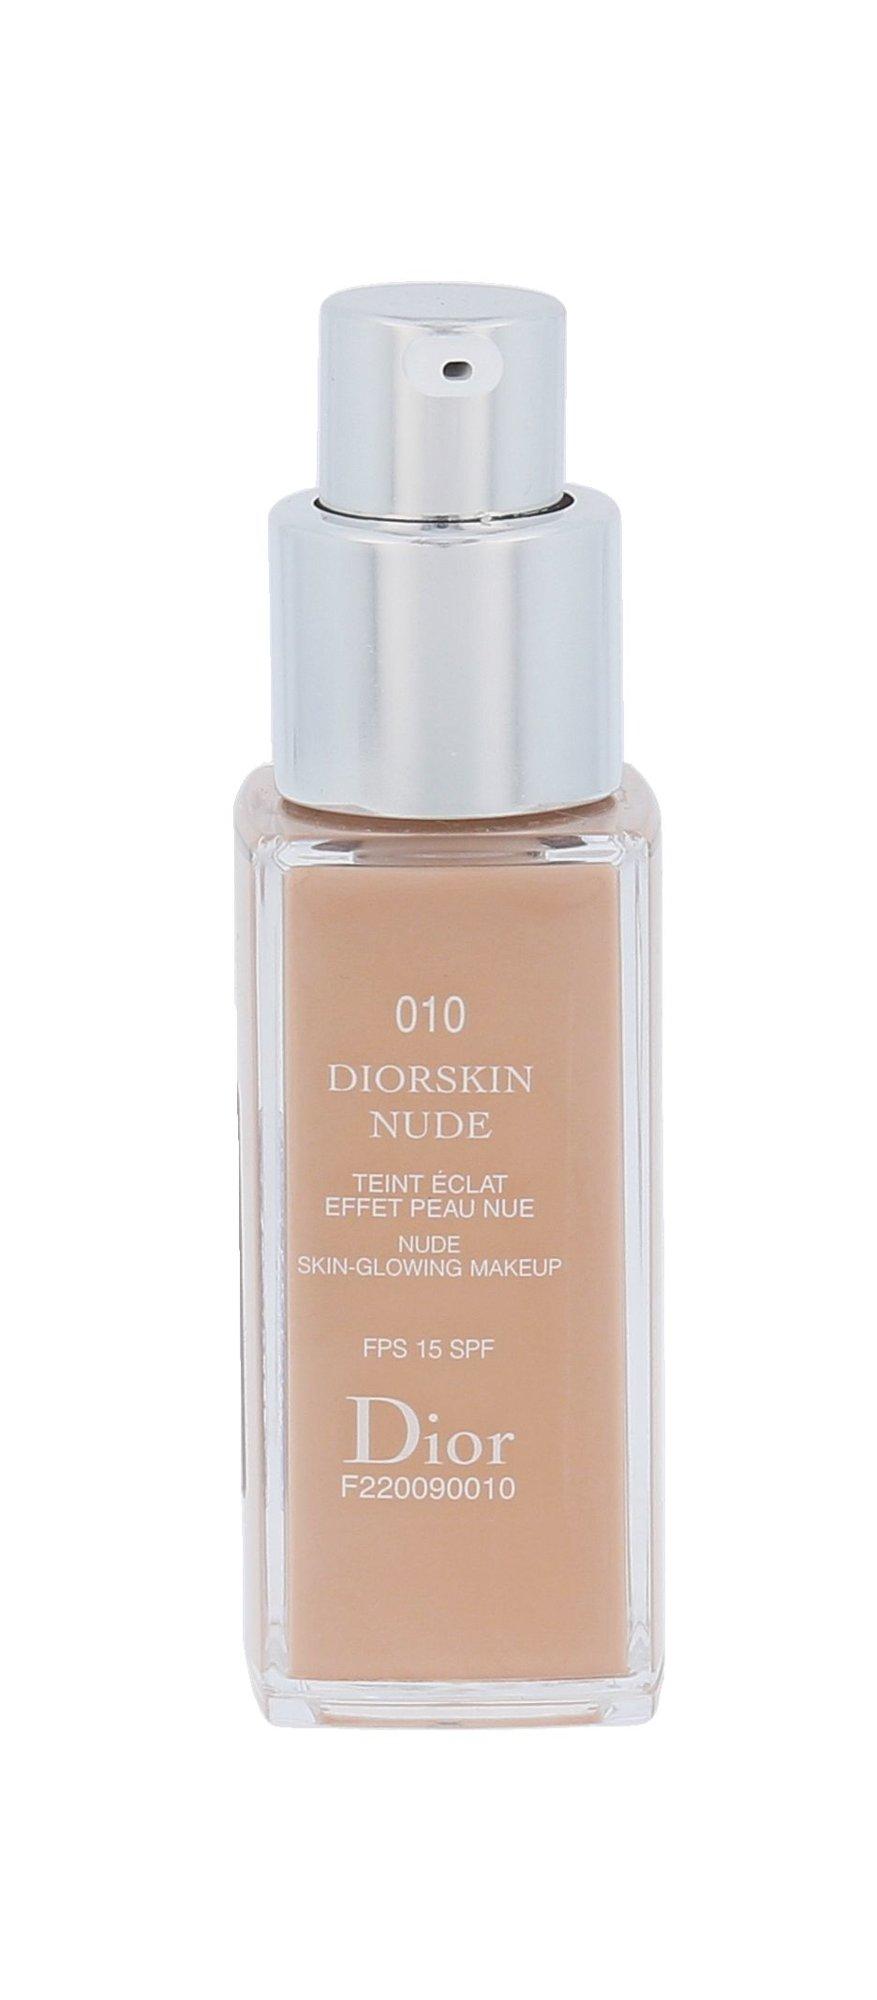 Christian Dior Diorskin Nude Cosmetic 20ml 010 Ivory